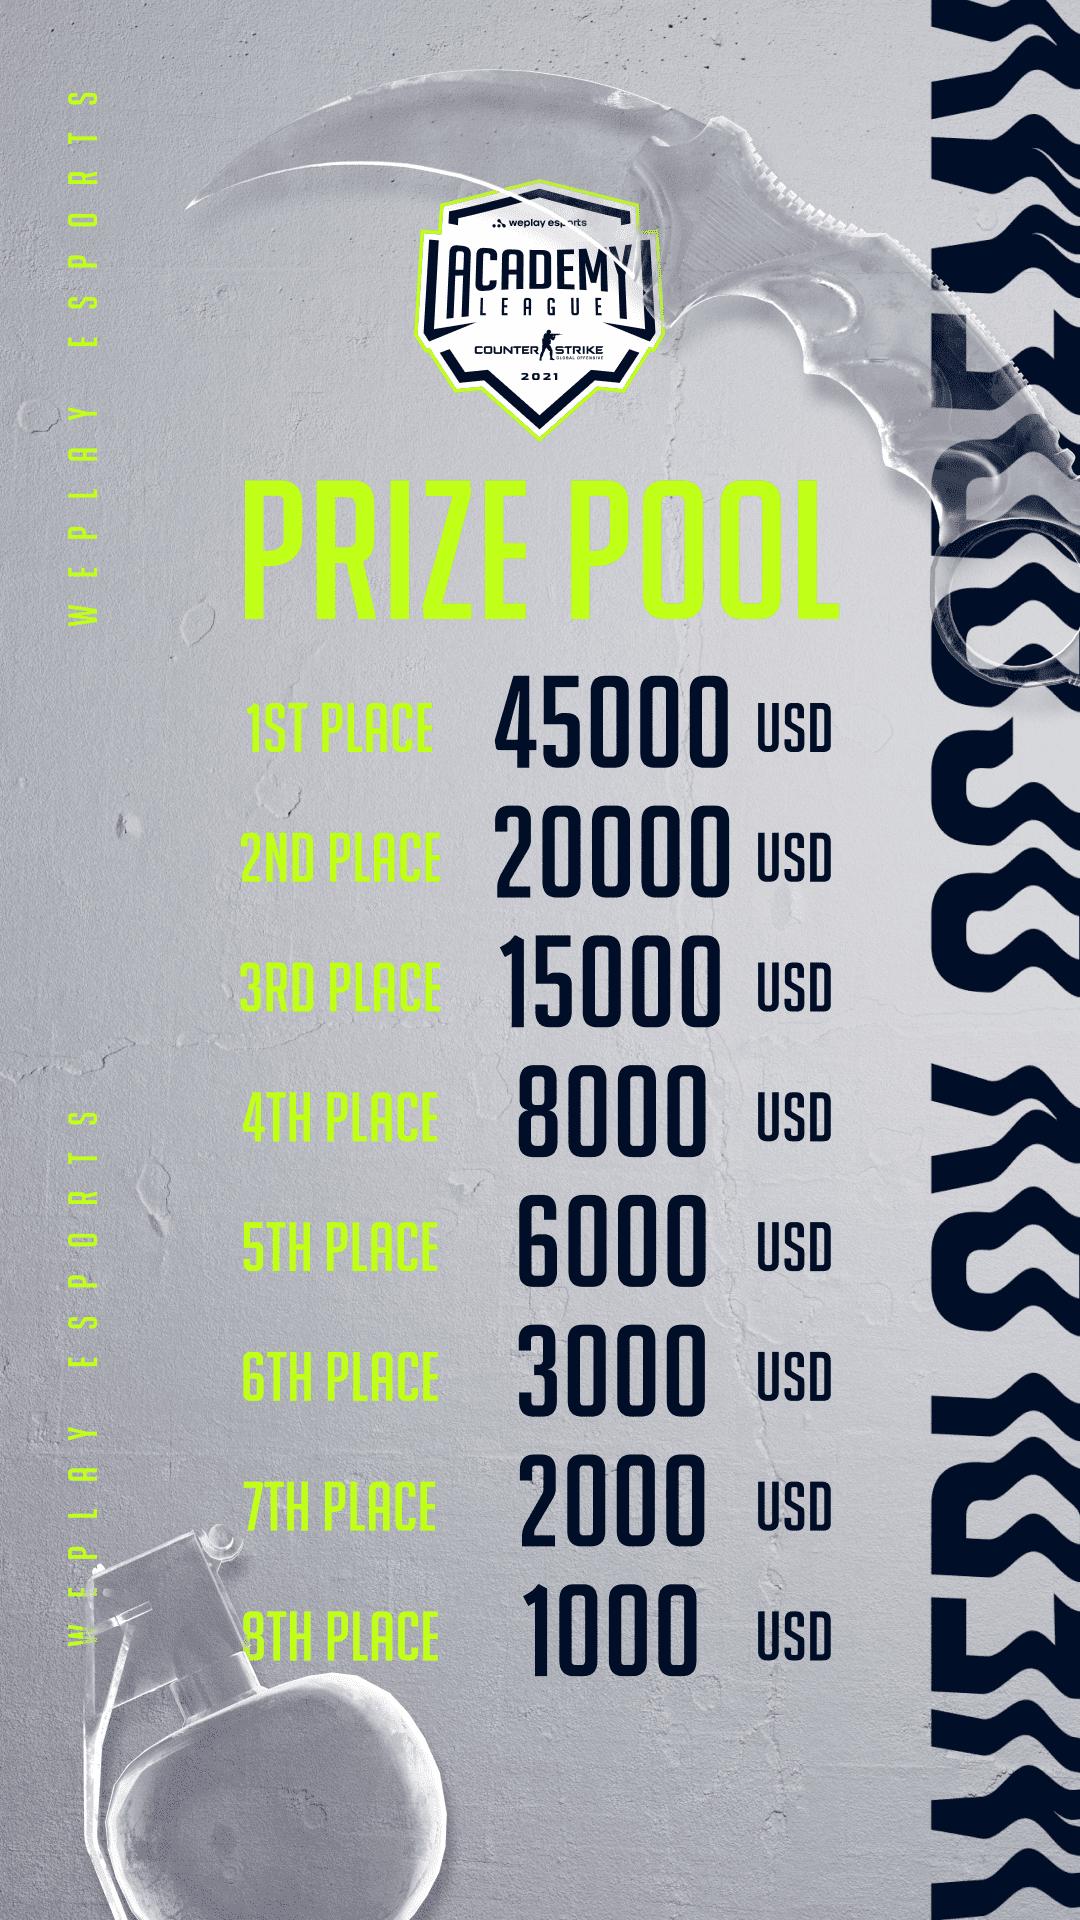 WePlay Academy League prize pool